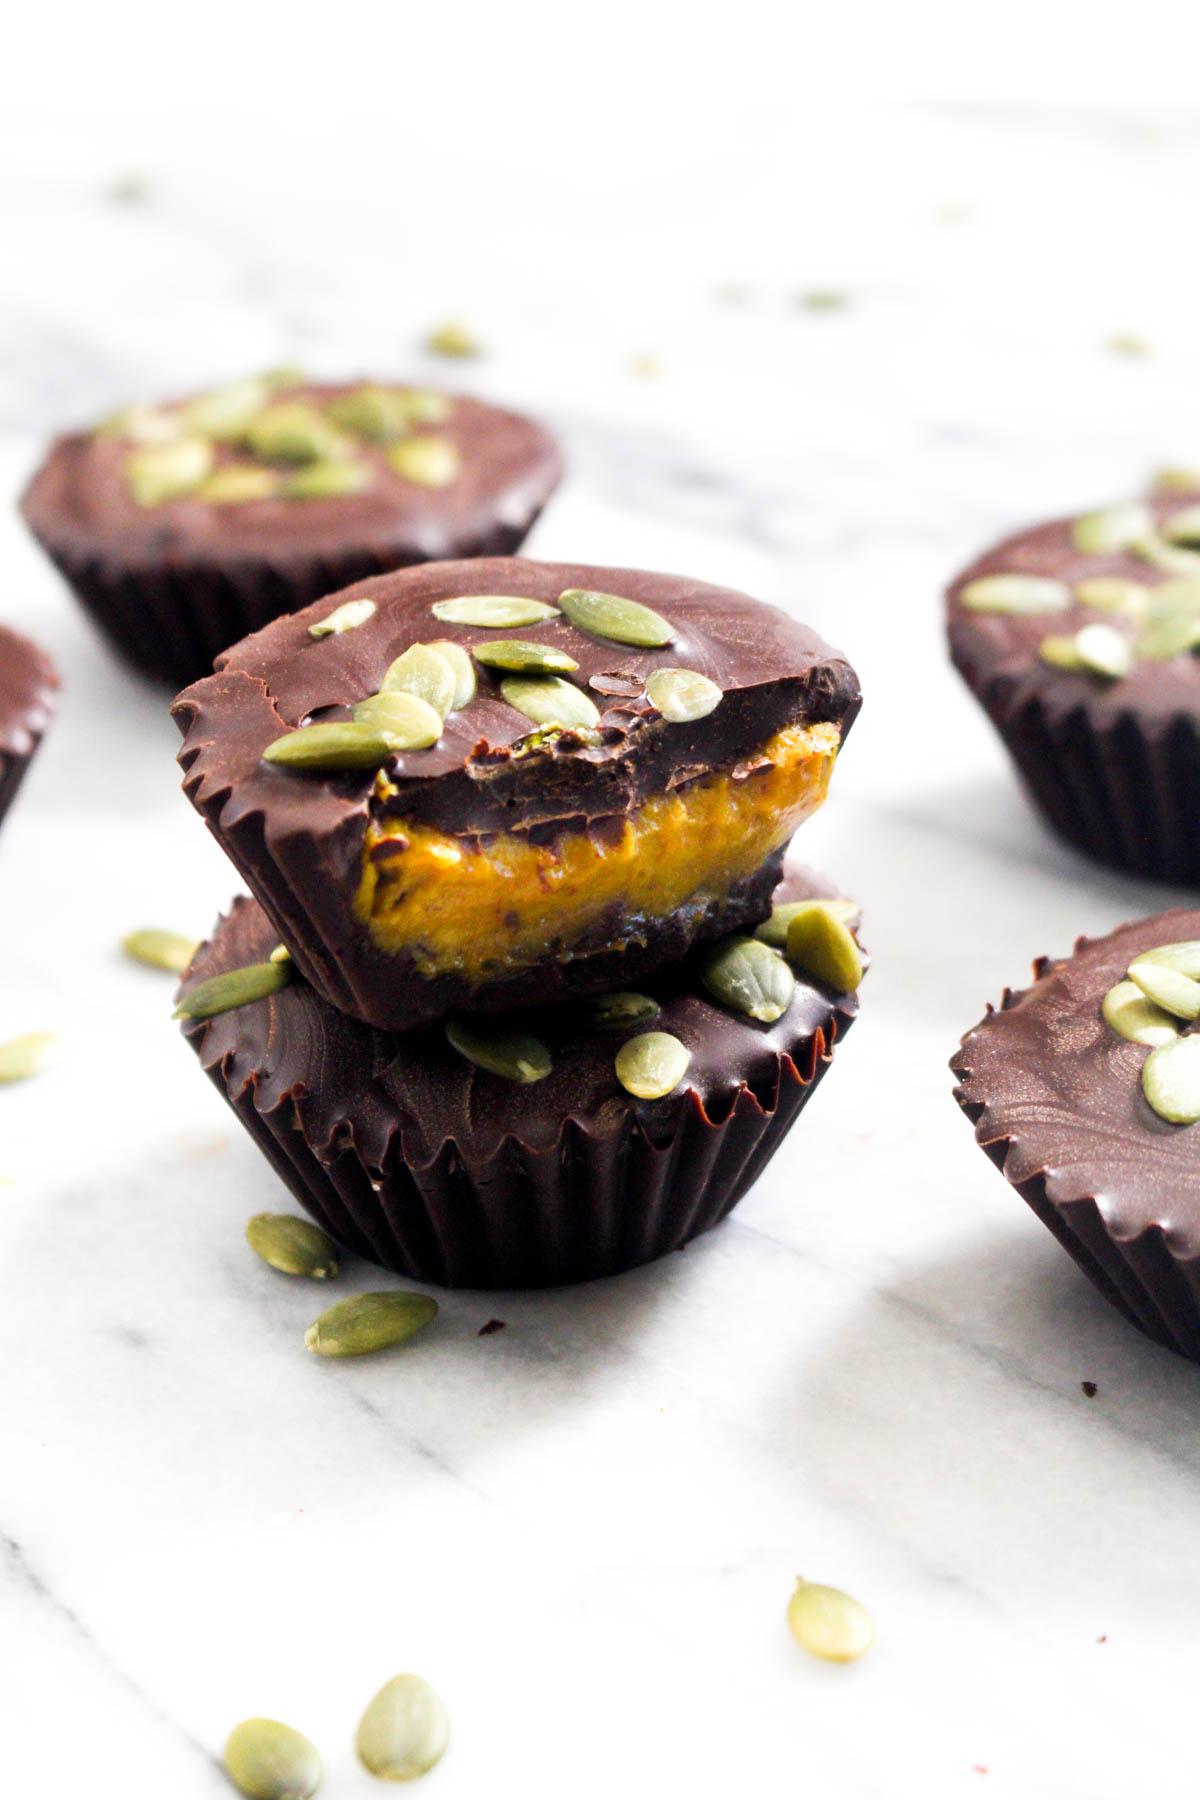 These Caramel Pumpkin Chocolate Cups are a simple no-bake Fall dessert recipe! Dark chocolate envelopes silky smooth pumpkin caramel.| CatchingSeeds.com